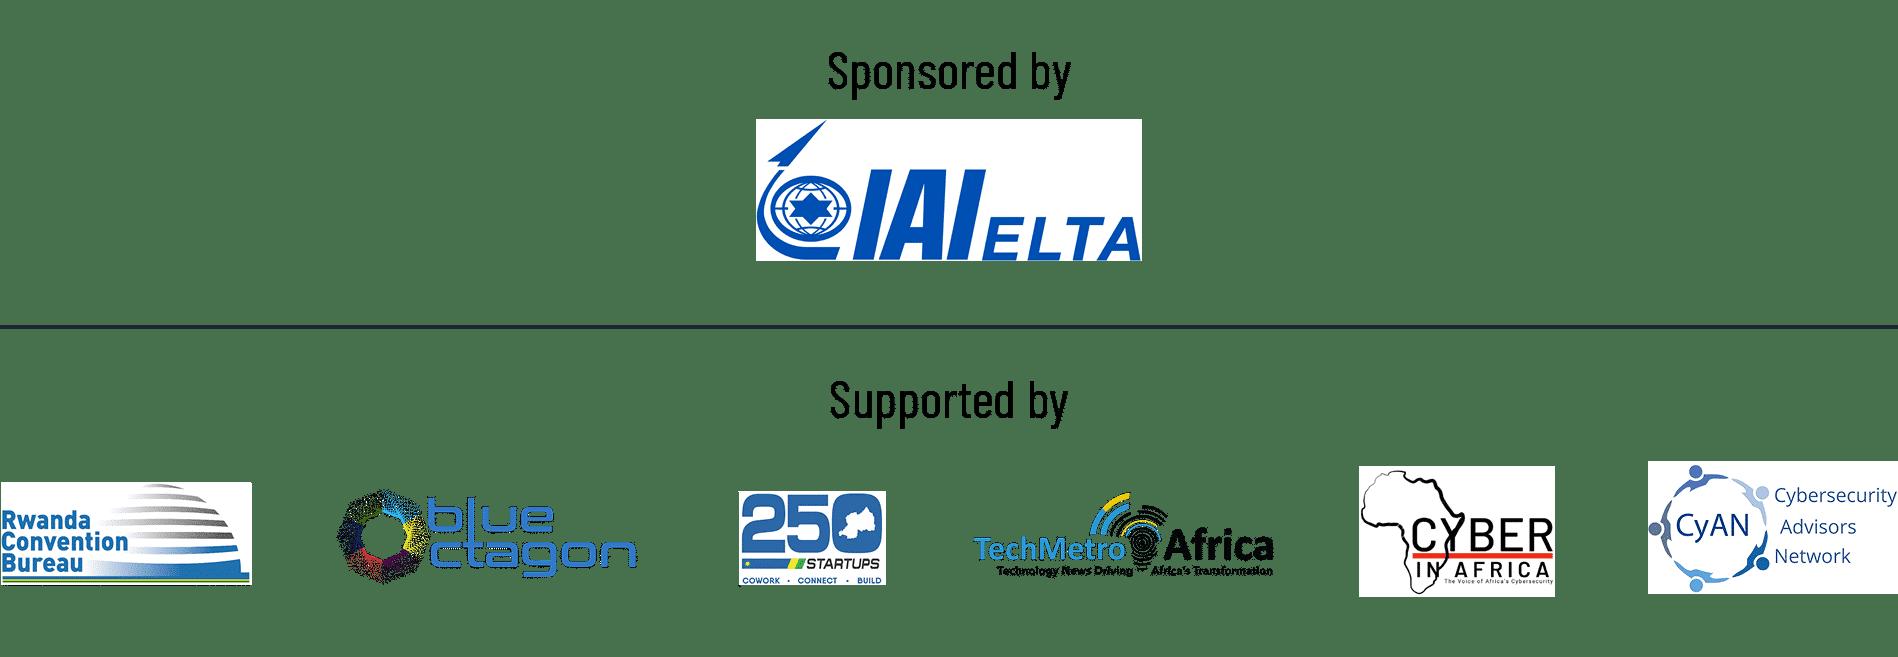 CybertechLive Africa 2020